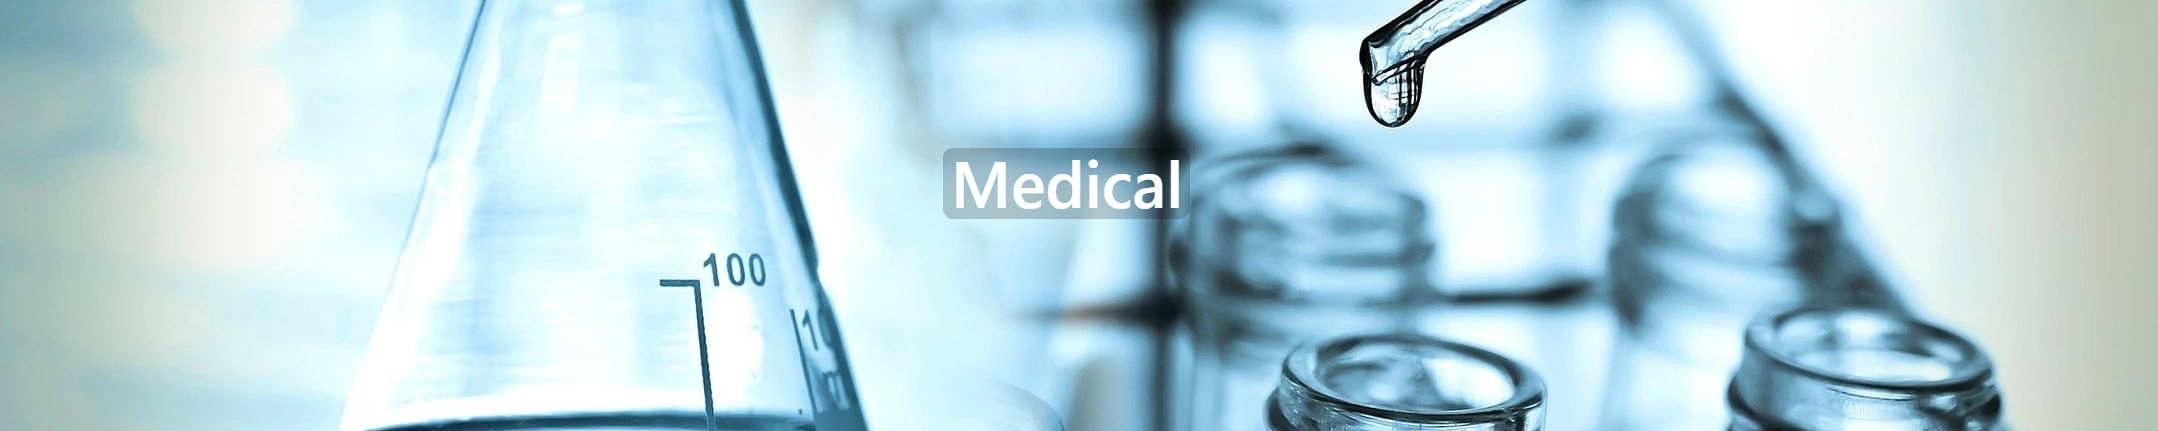 medical equipment medical device calibration services images acs calibration laboratory acs calibration company alabama